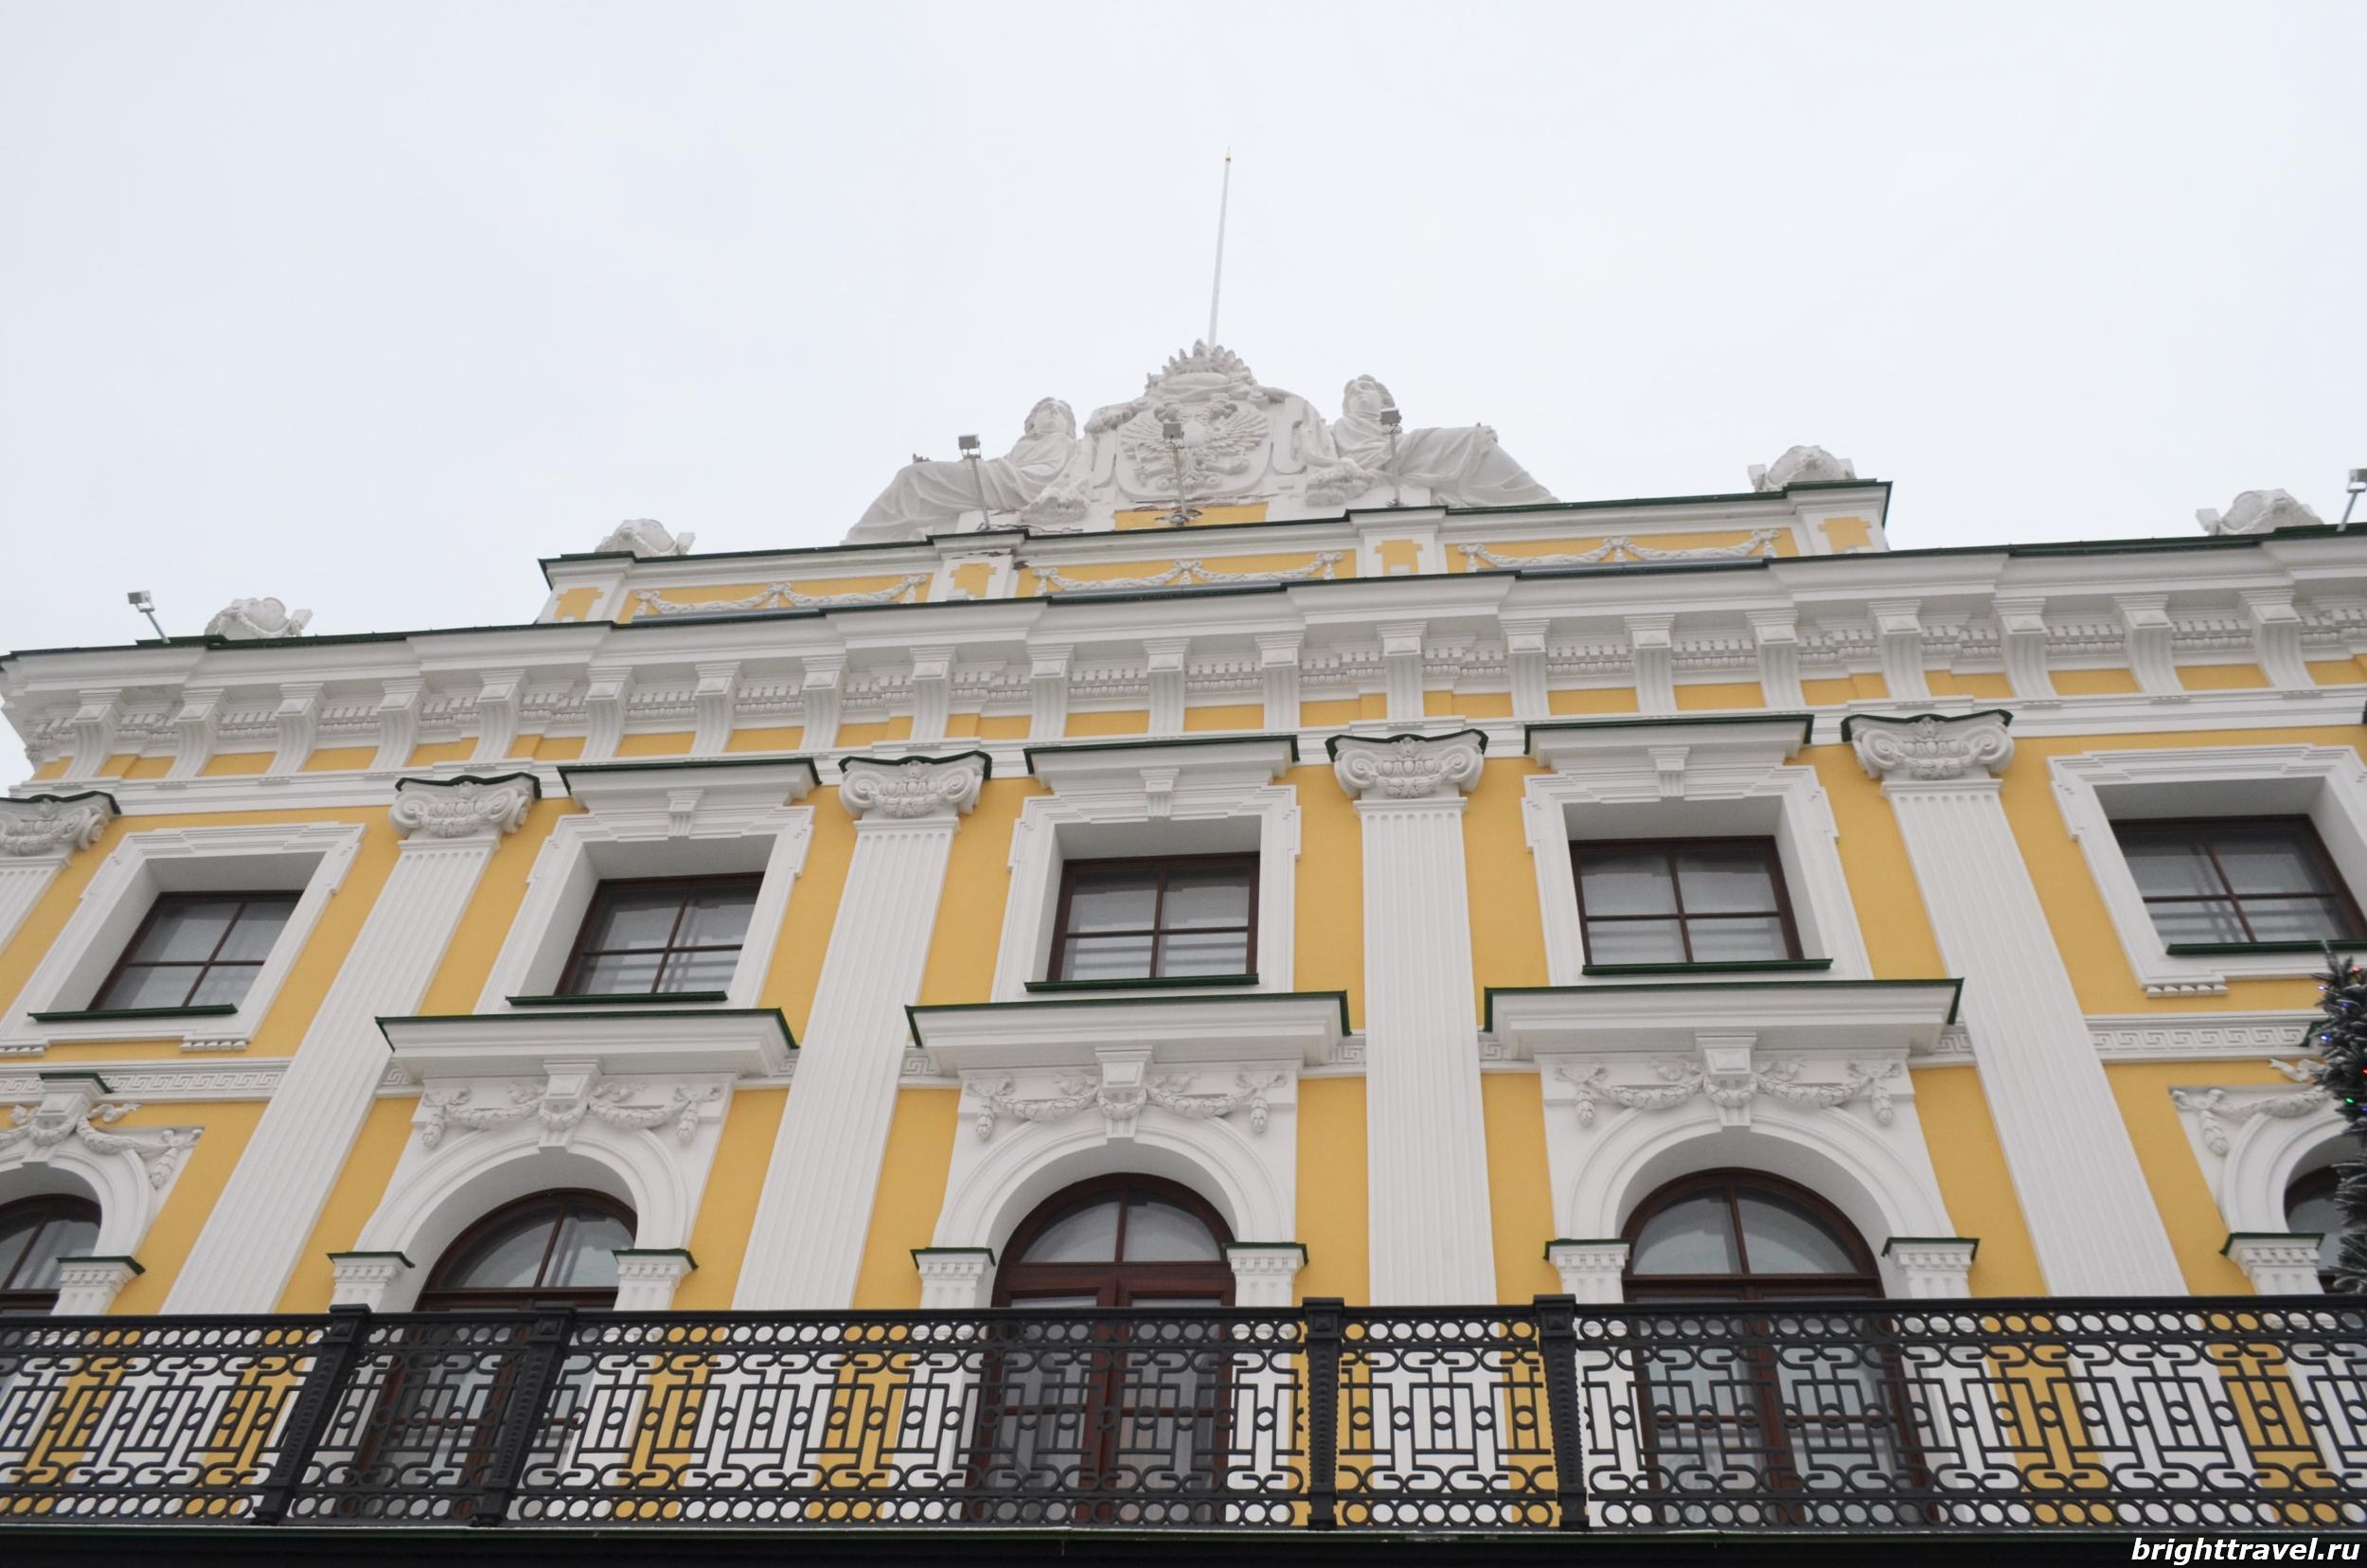 Фасад главного корпуса Императорского дворца Твери